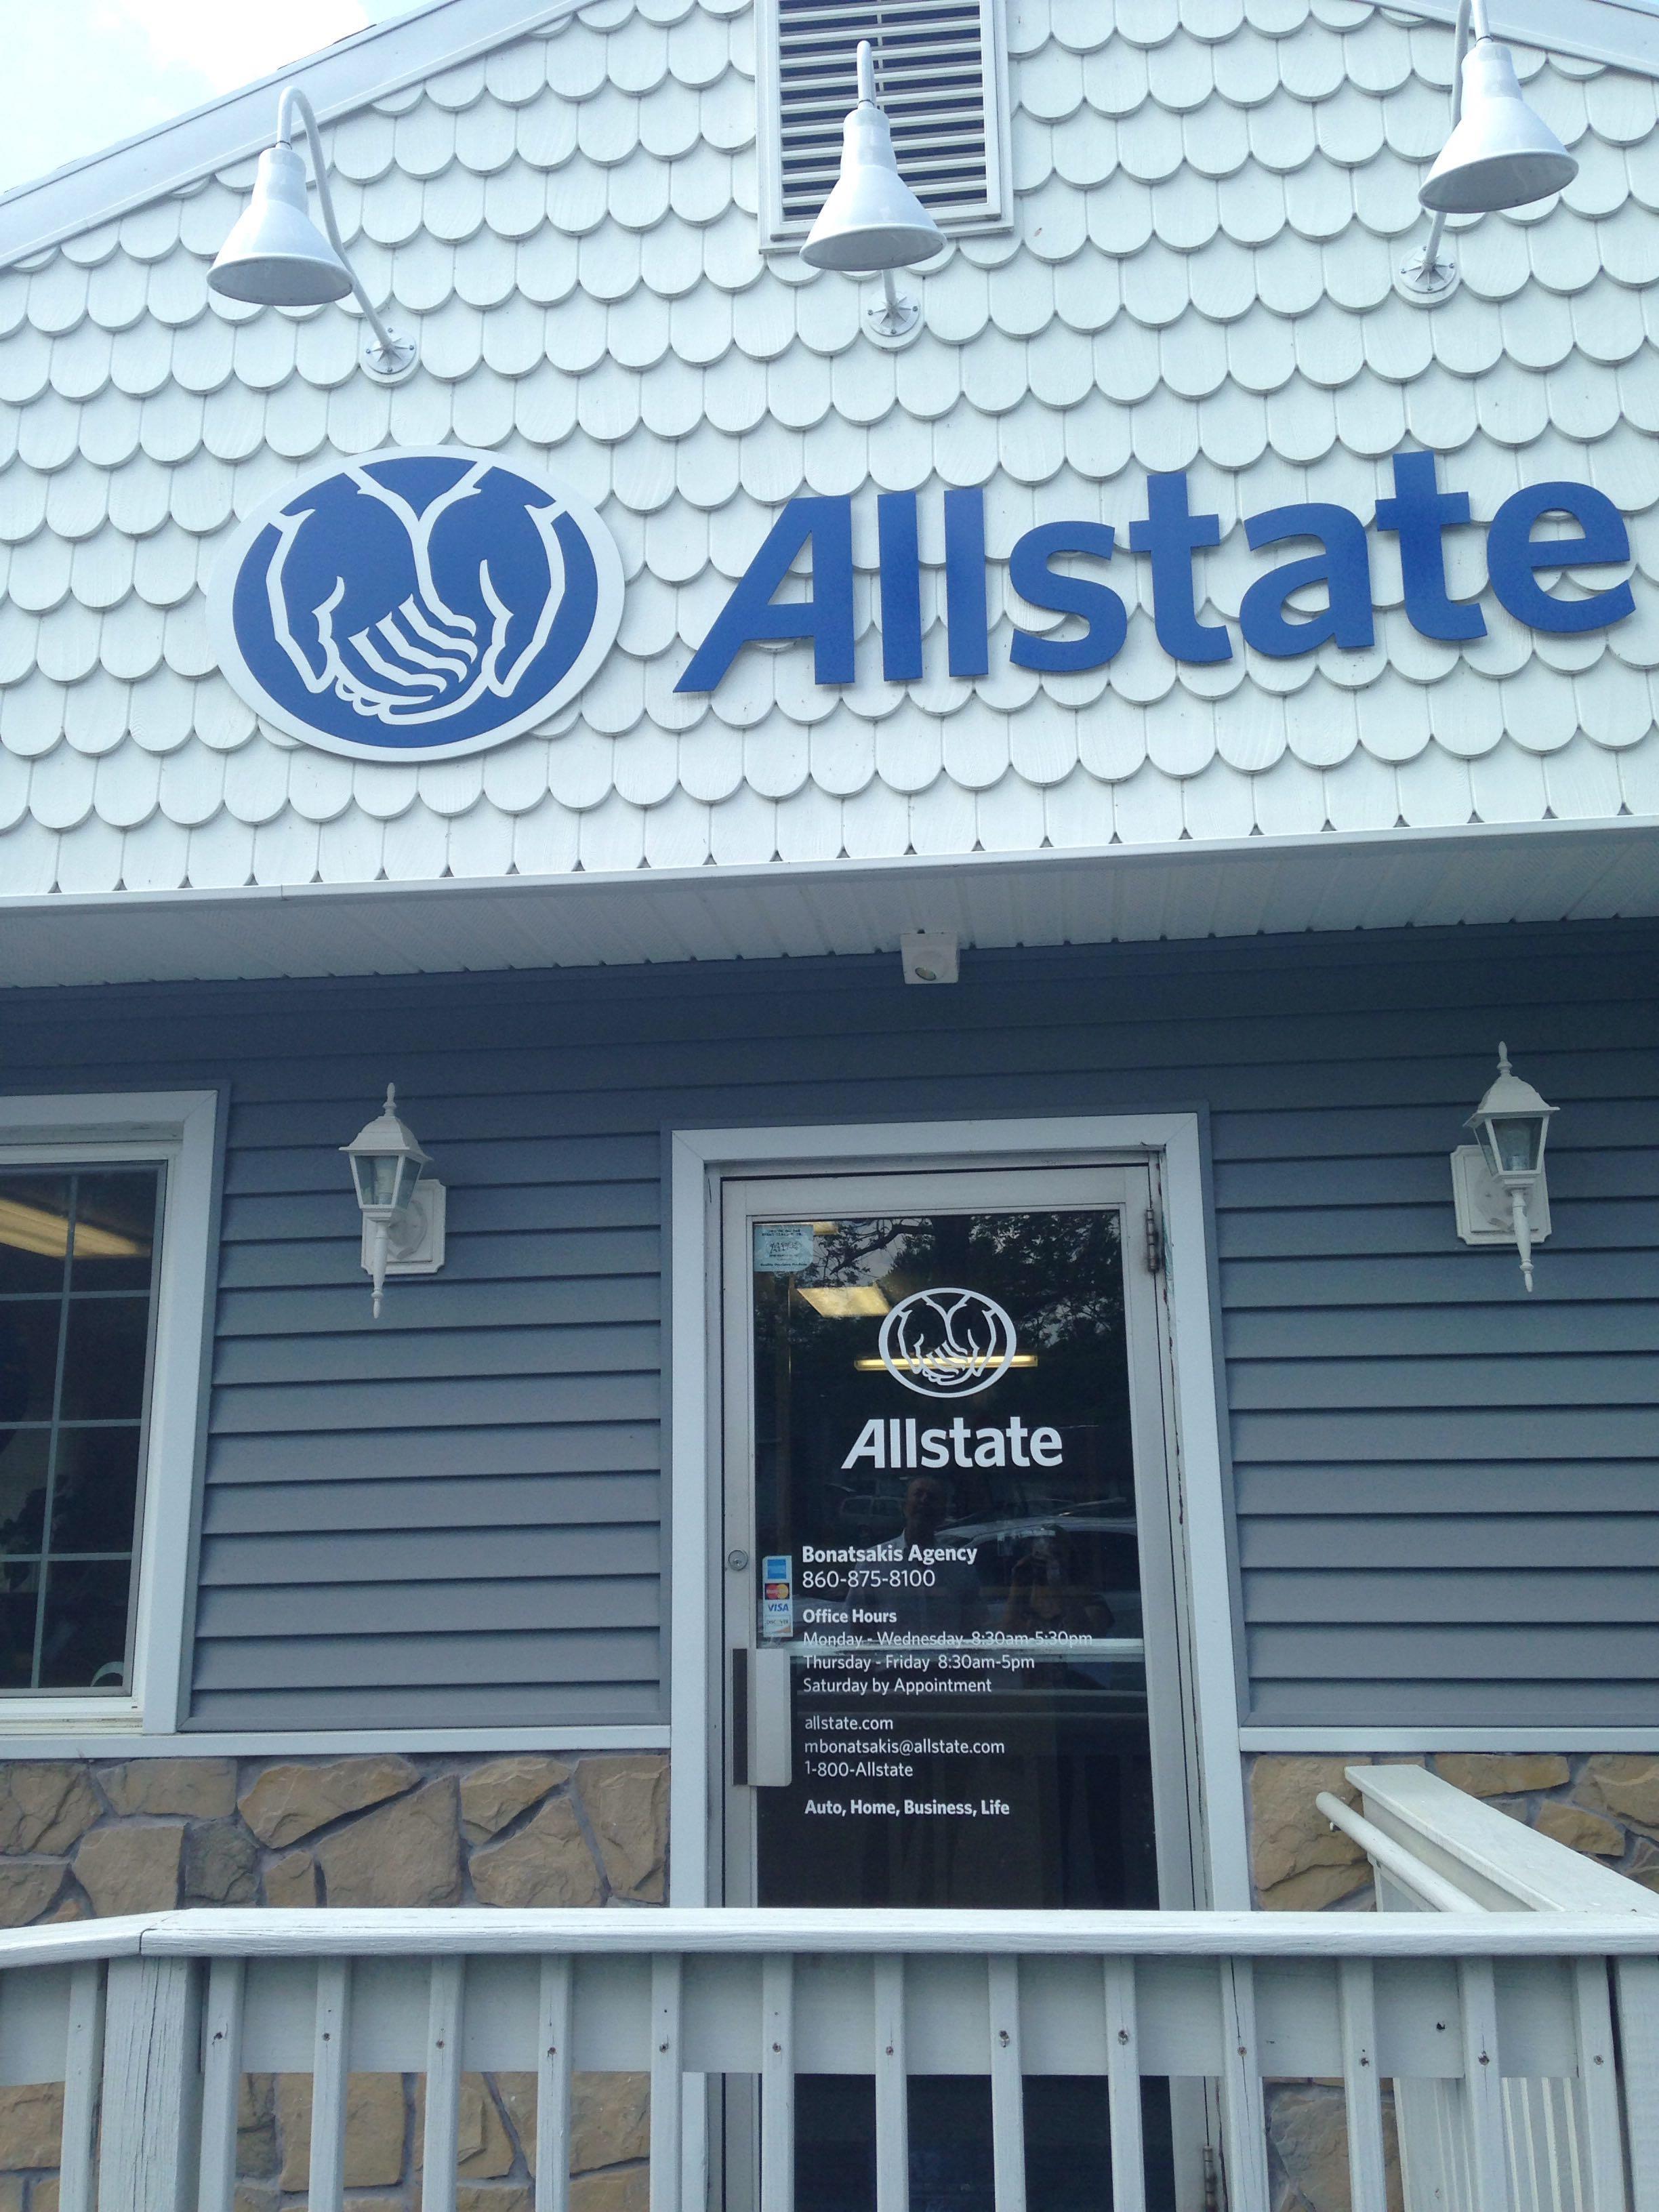 Mike Bonatsakis: Allstate Insurance image 1